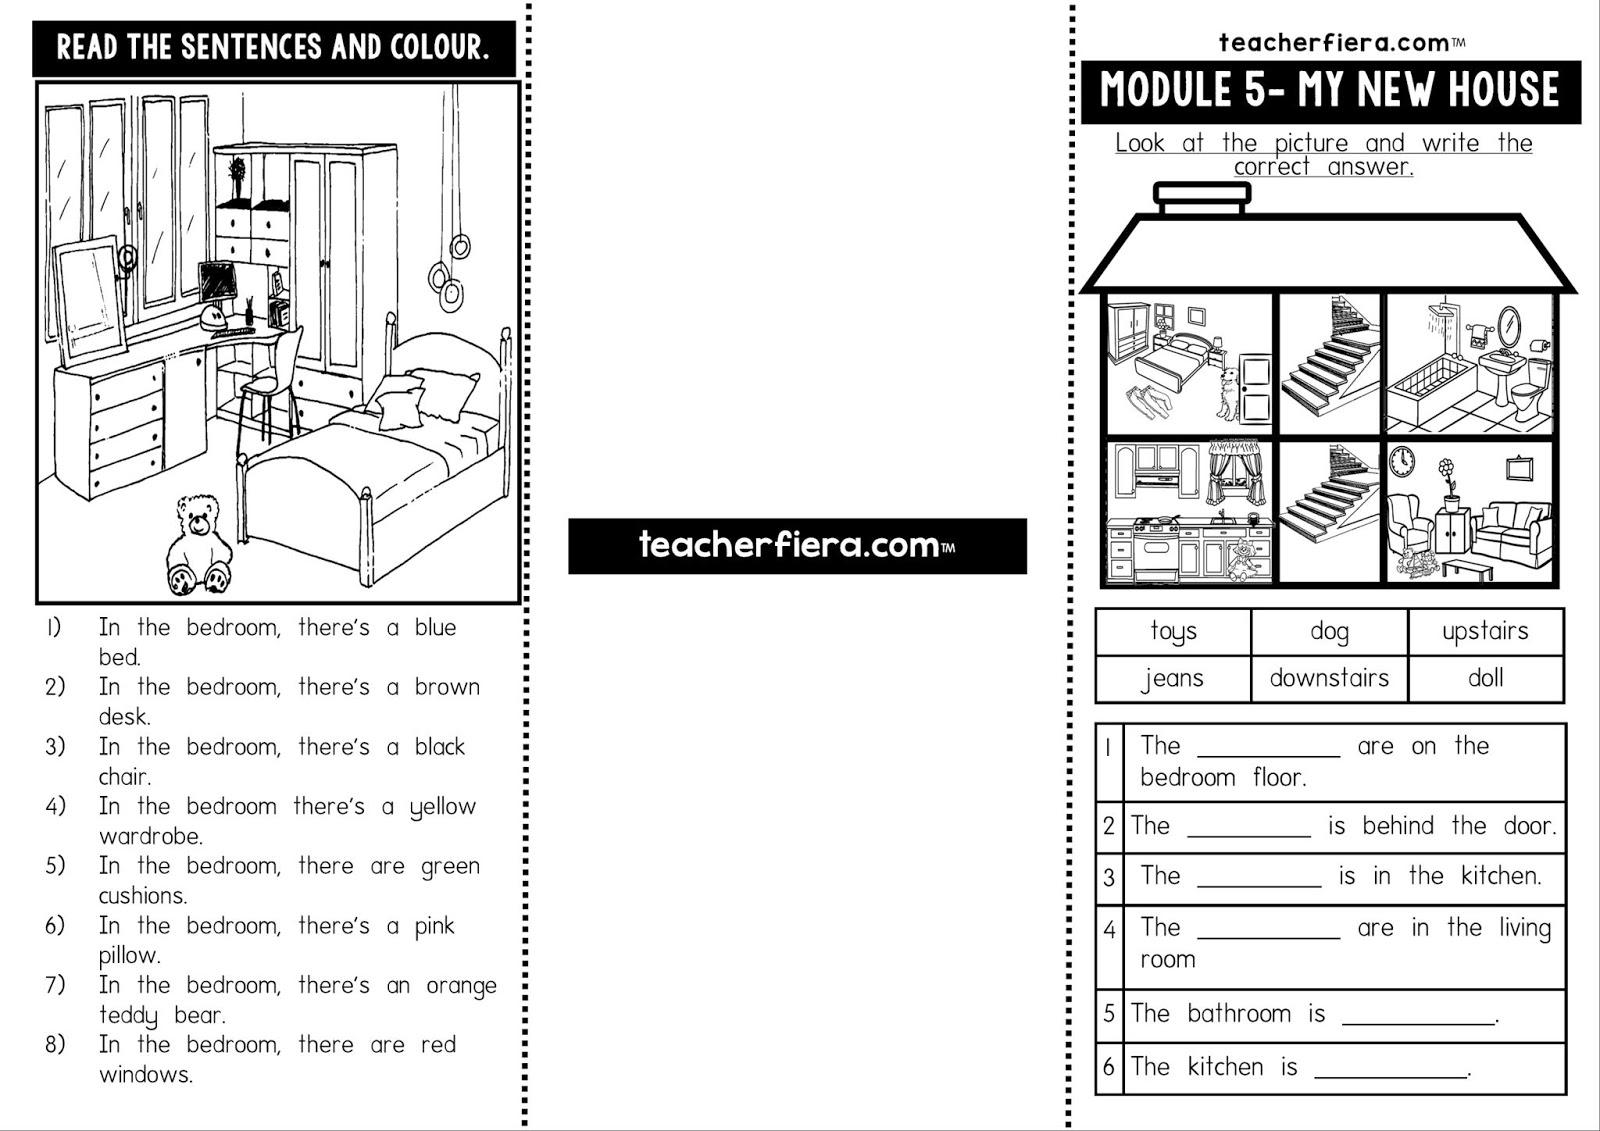 Teacherfiera Year 3 Module 5 Brochure Based On The